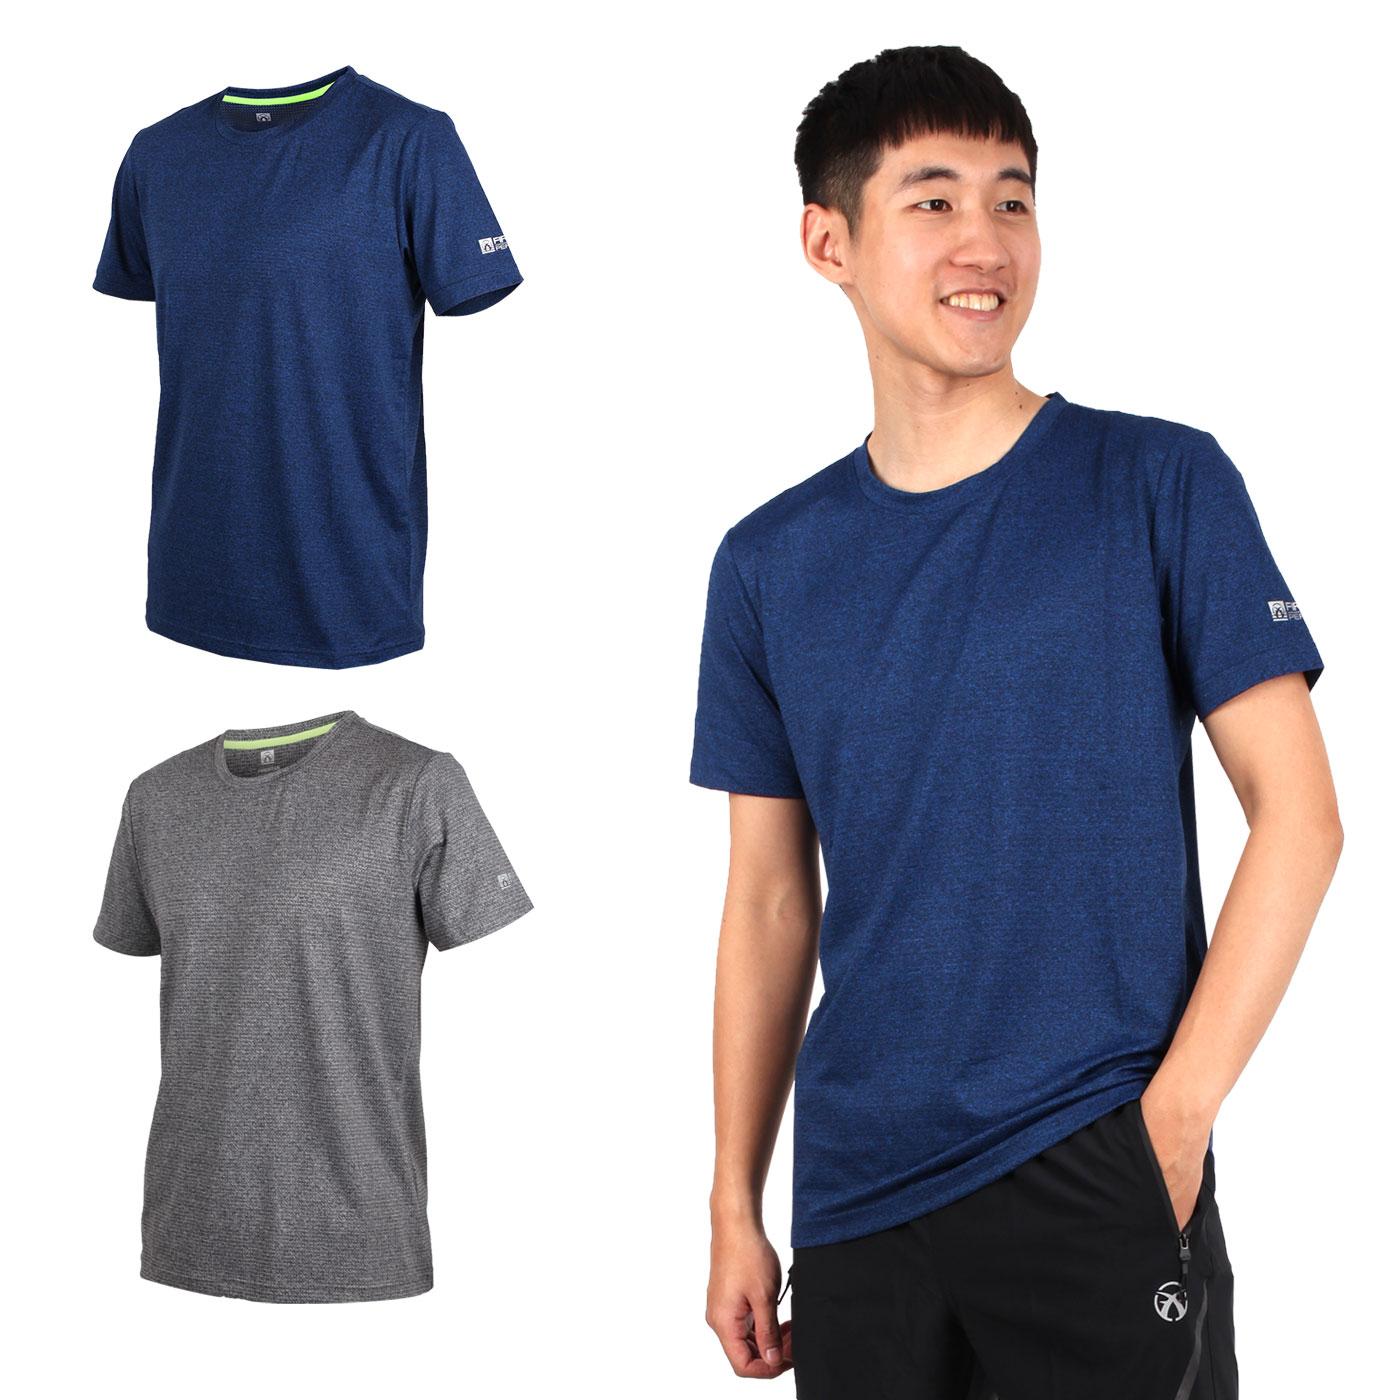 FIRESTAR 男彈性短袖圓領T恤 D9232-18